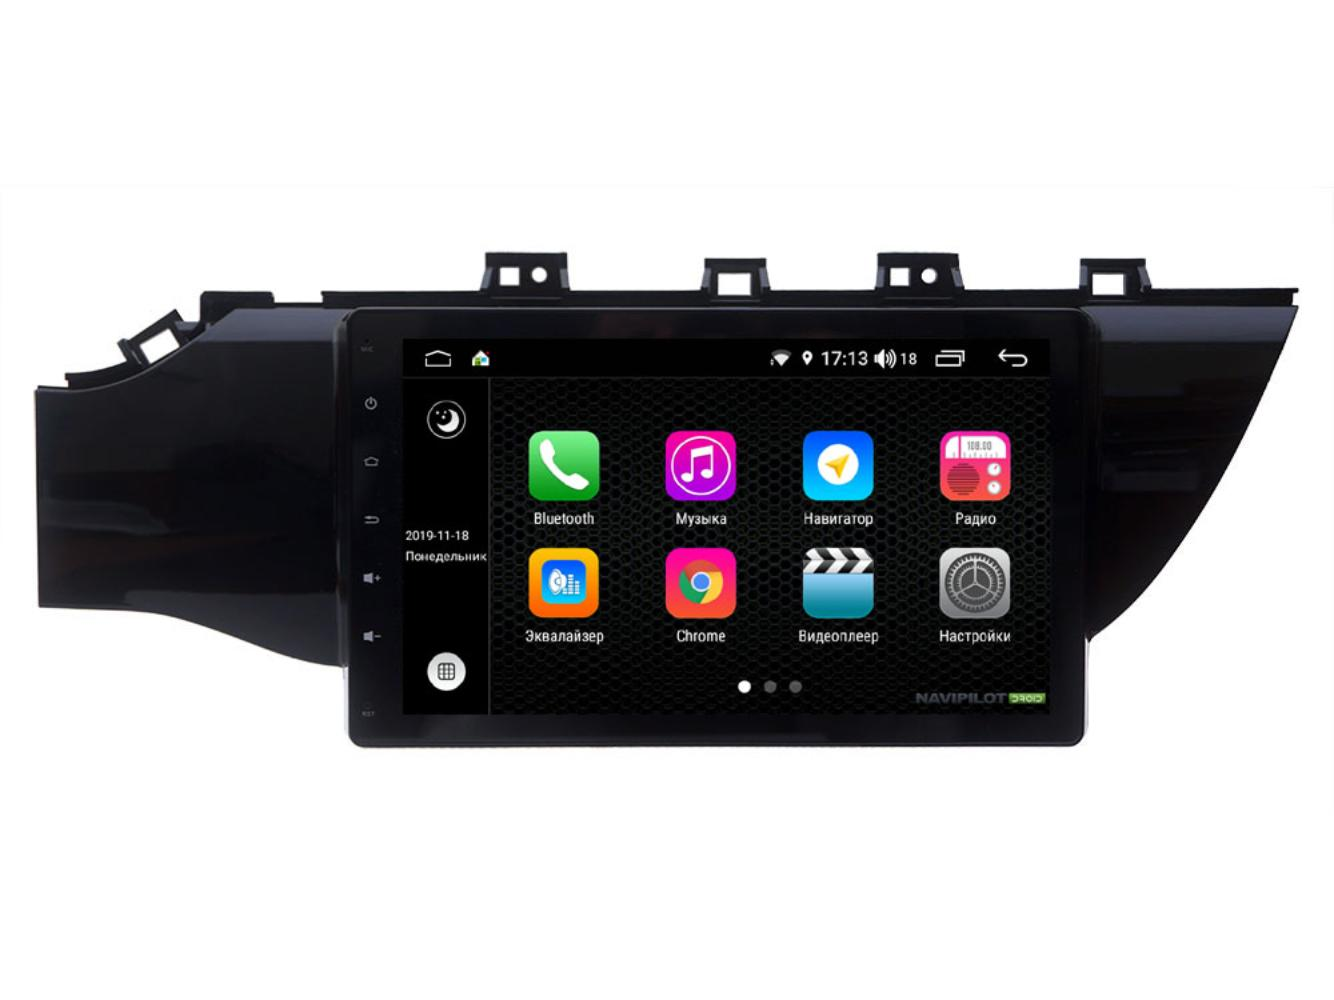 Автомагнитола NaviPilot DROID9L для Kia Rio / Rio X-Line 2017 - н.в. 10 (+ Камера заднего вида в подарок!) автомагнитола navipilot droid9l для fiat ducato 2011 н в камера заднего вида в подарок